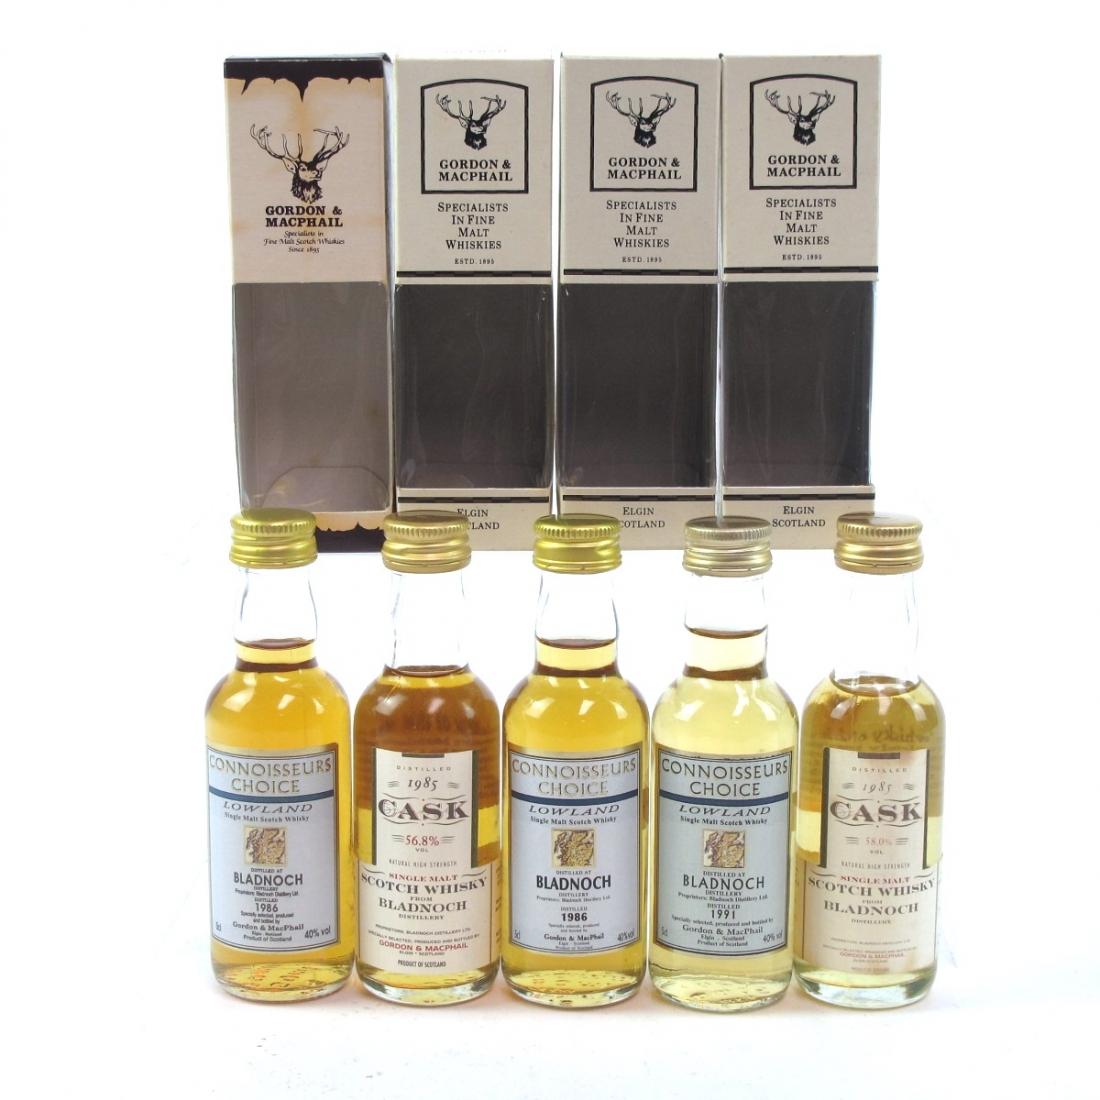 Bladnoch Miniature Selection 5 x 5cl